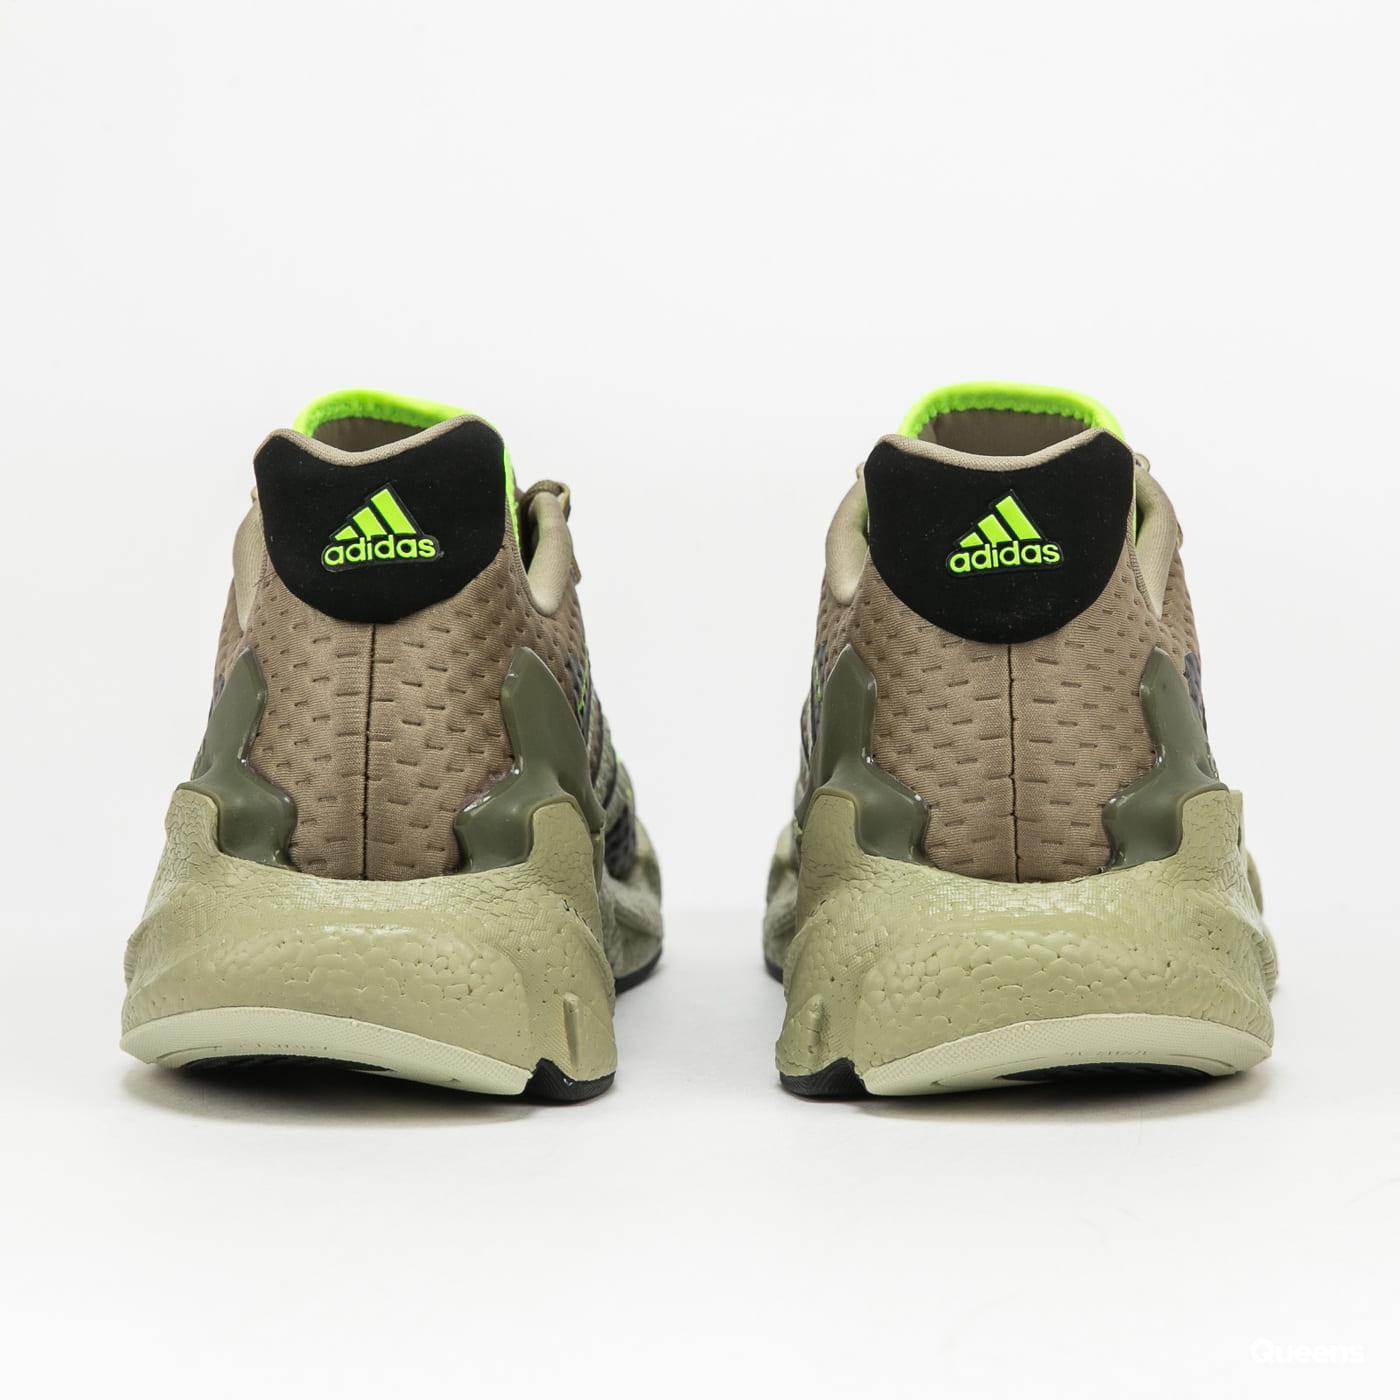 adidas Performance X9000L4 M C.RDY orbgrn / halgrn / cblack